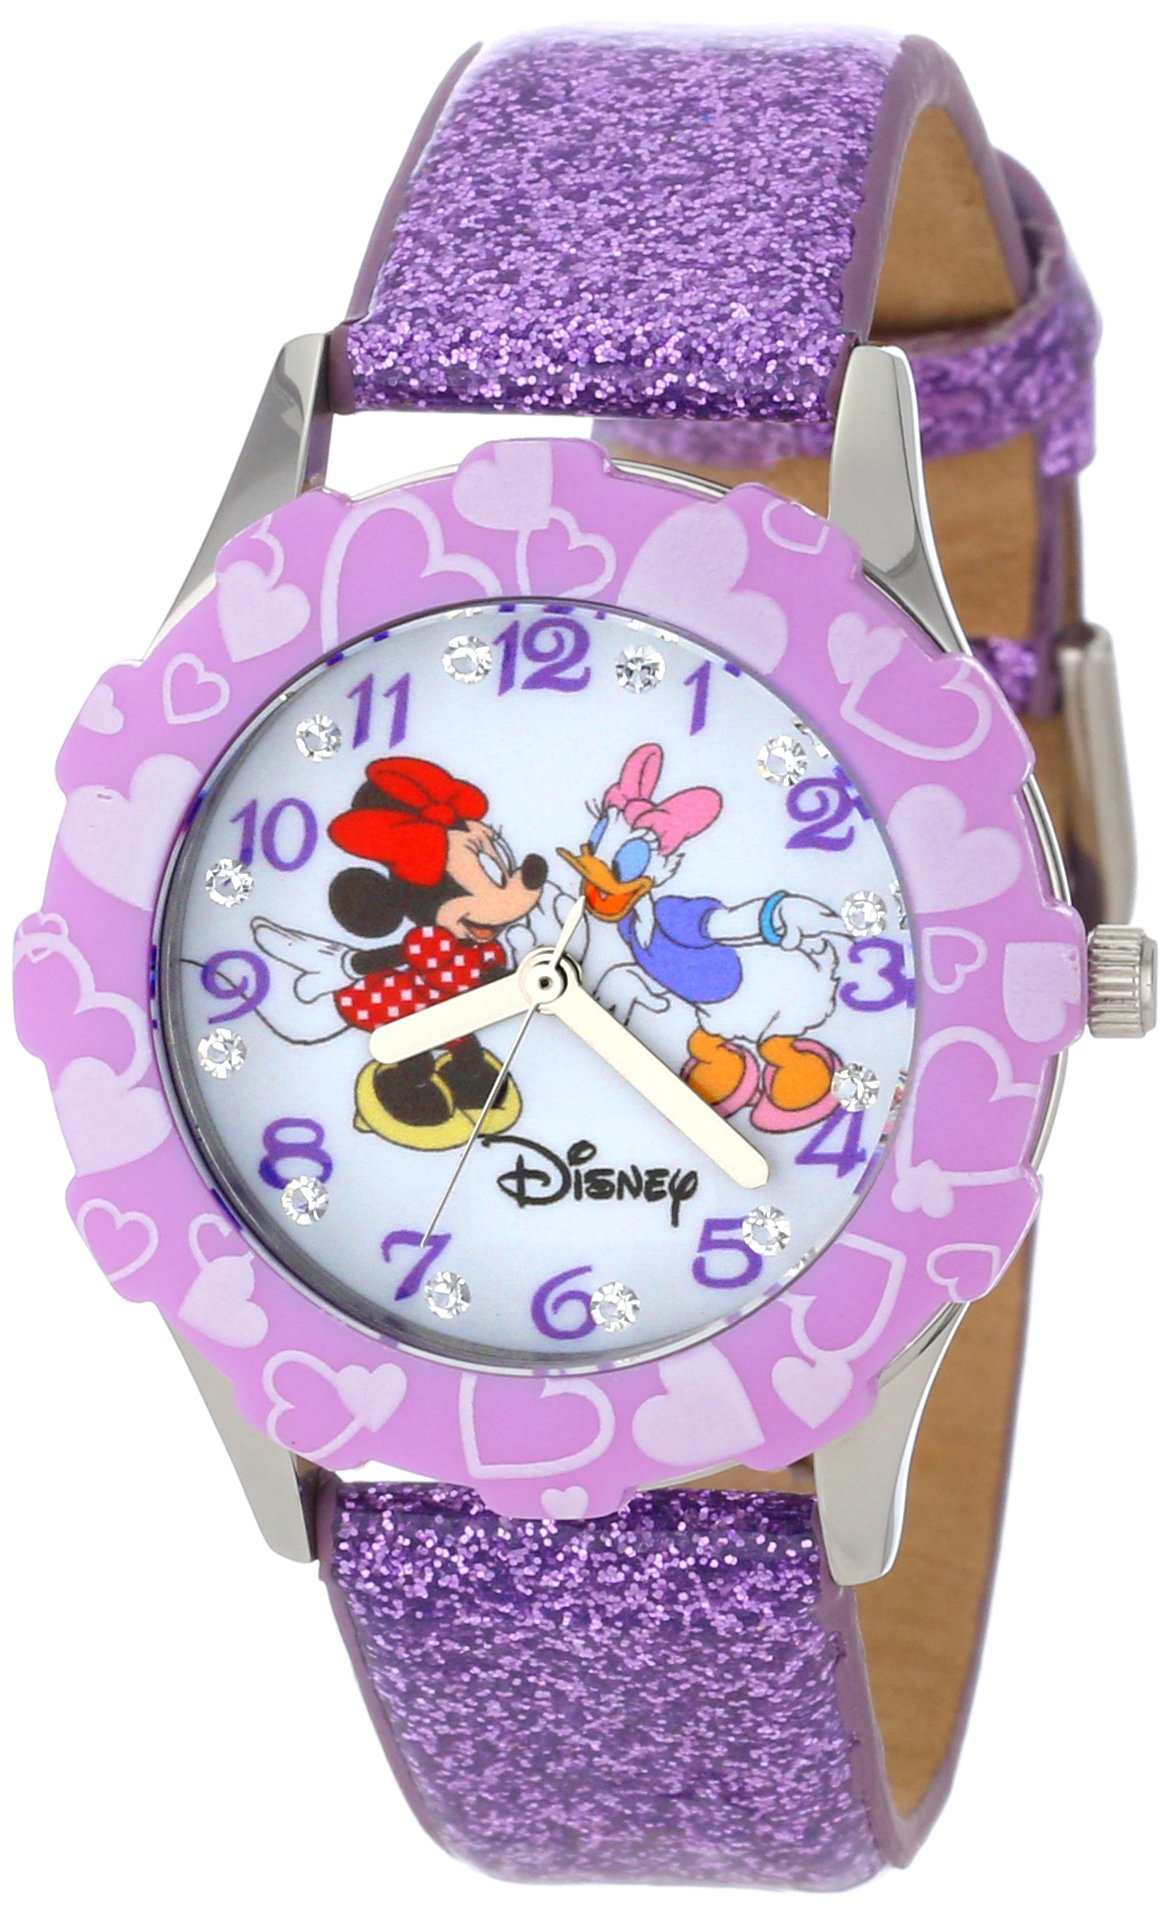 Disney Kids' W000916 ''Tween Minnie Glitz'' Stainless Steel Watch with Purple Glitter Band by Disney